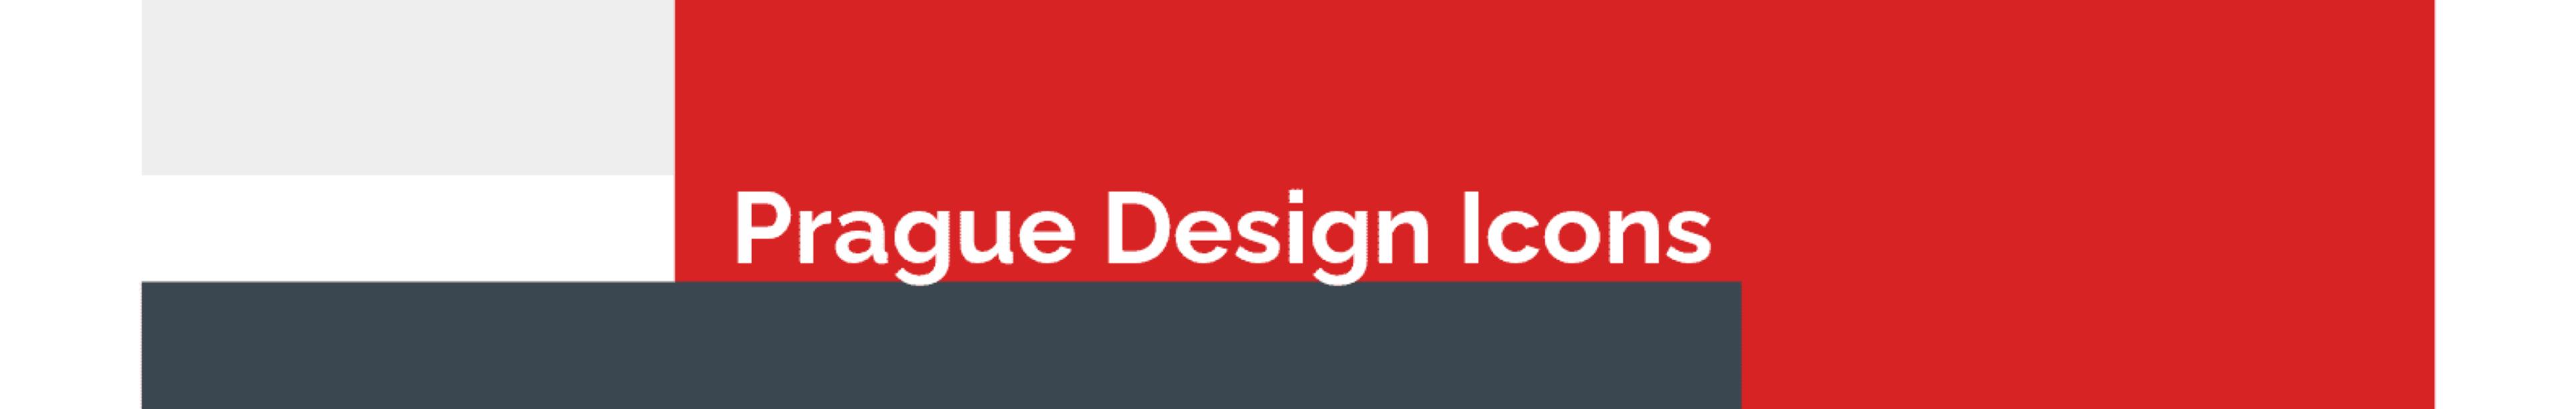 Prague Design Icons